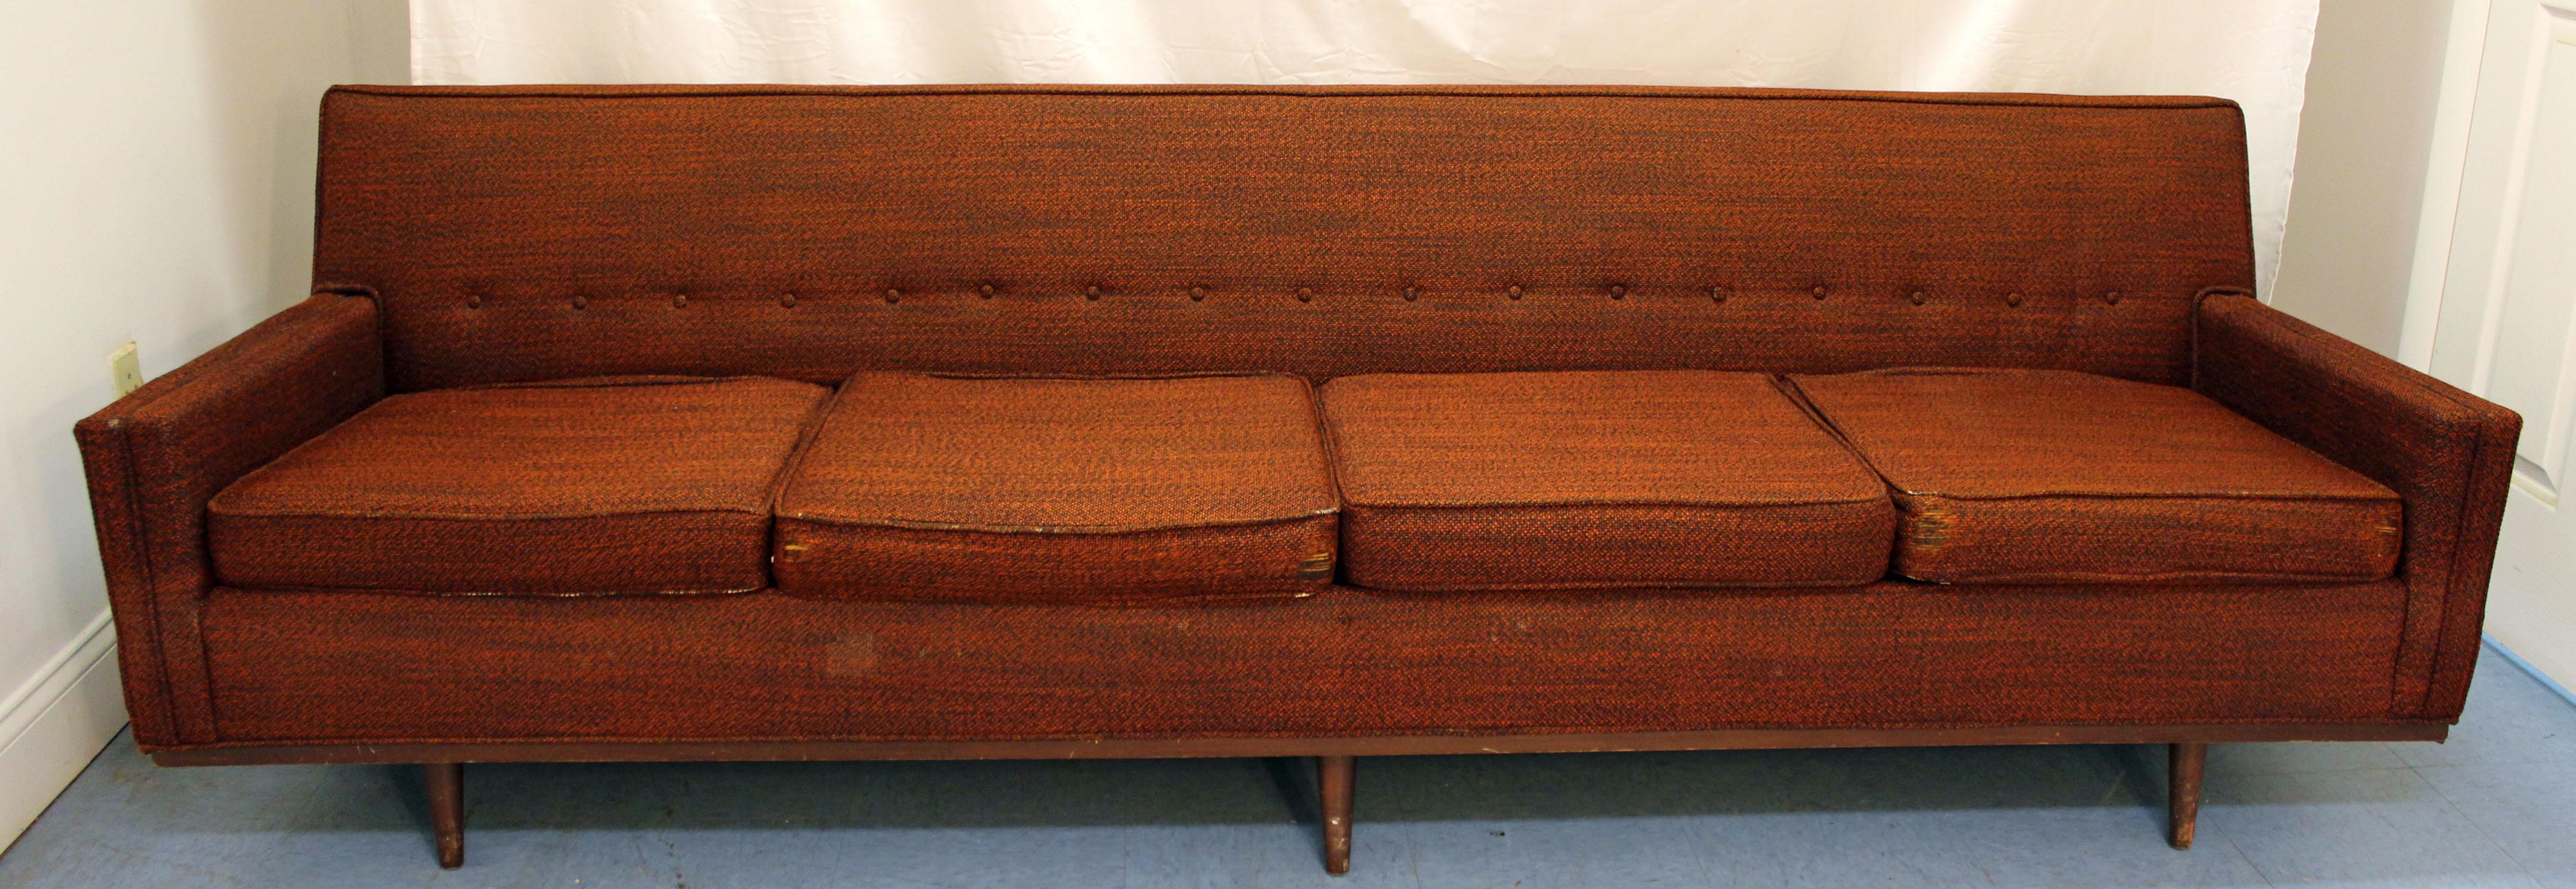 Mid Century Danish Modern Selig Of Monroe 4 Cushion Sofa   Image 2 Of